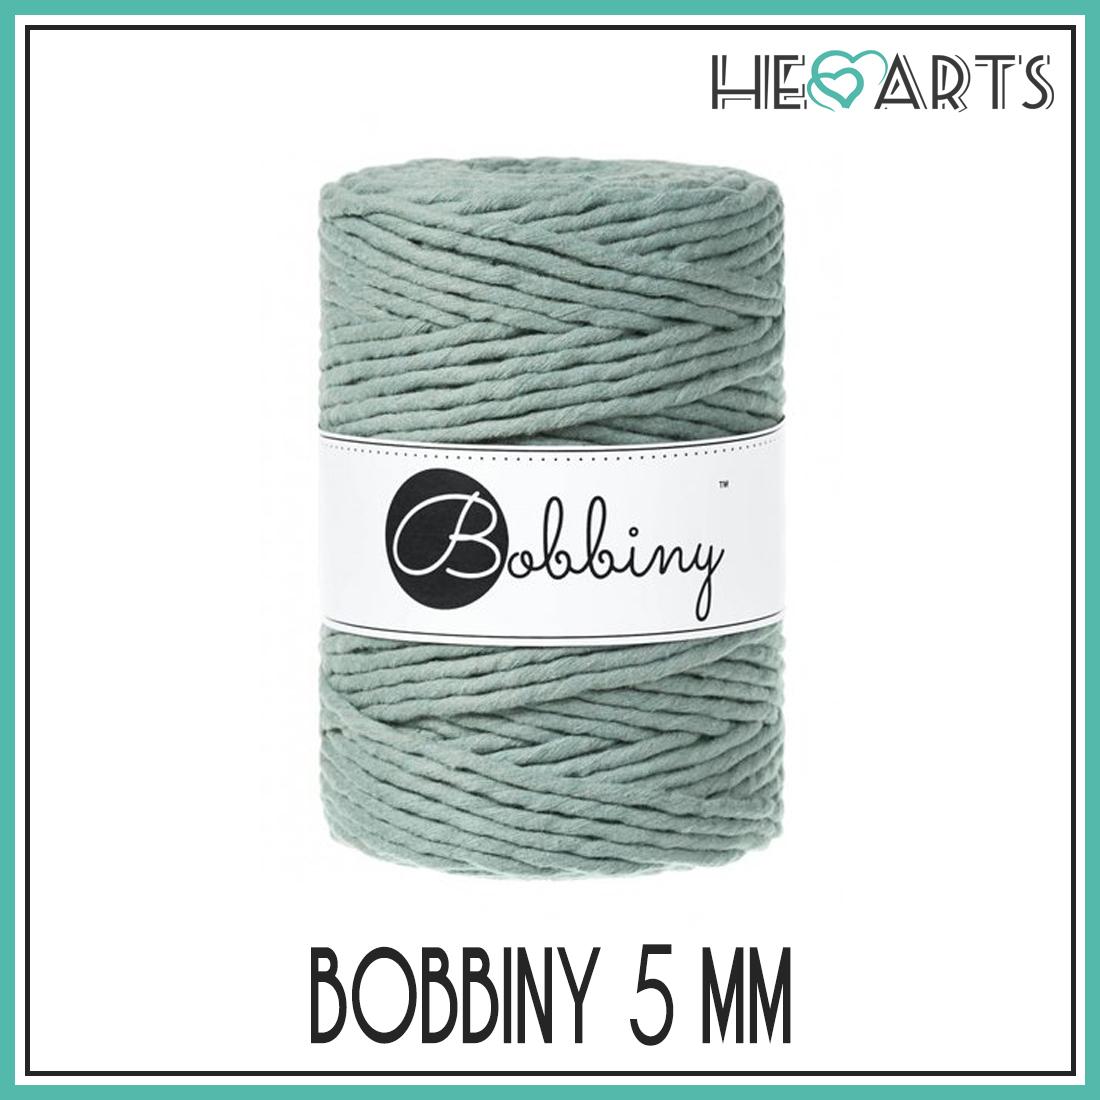 Bobbiny macrame garen 5 mm